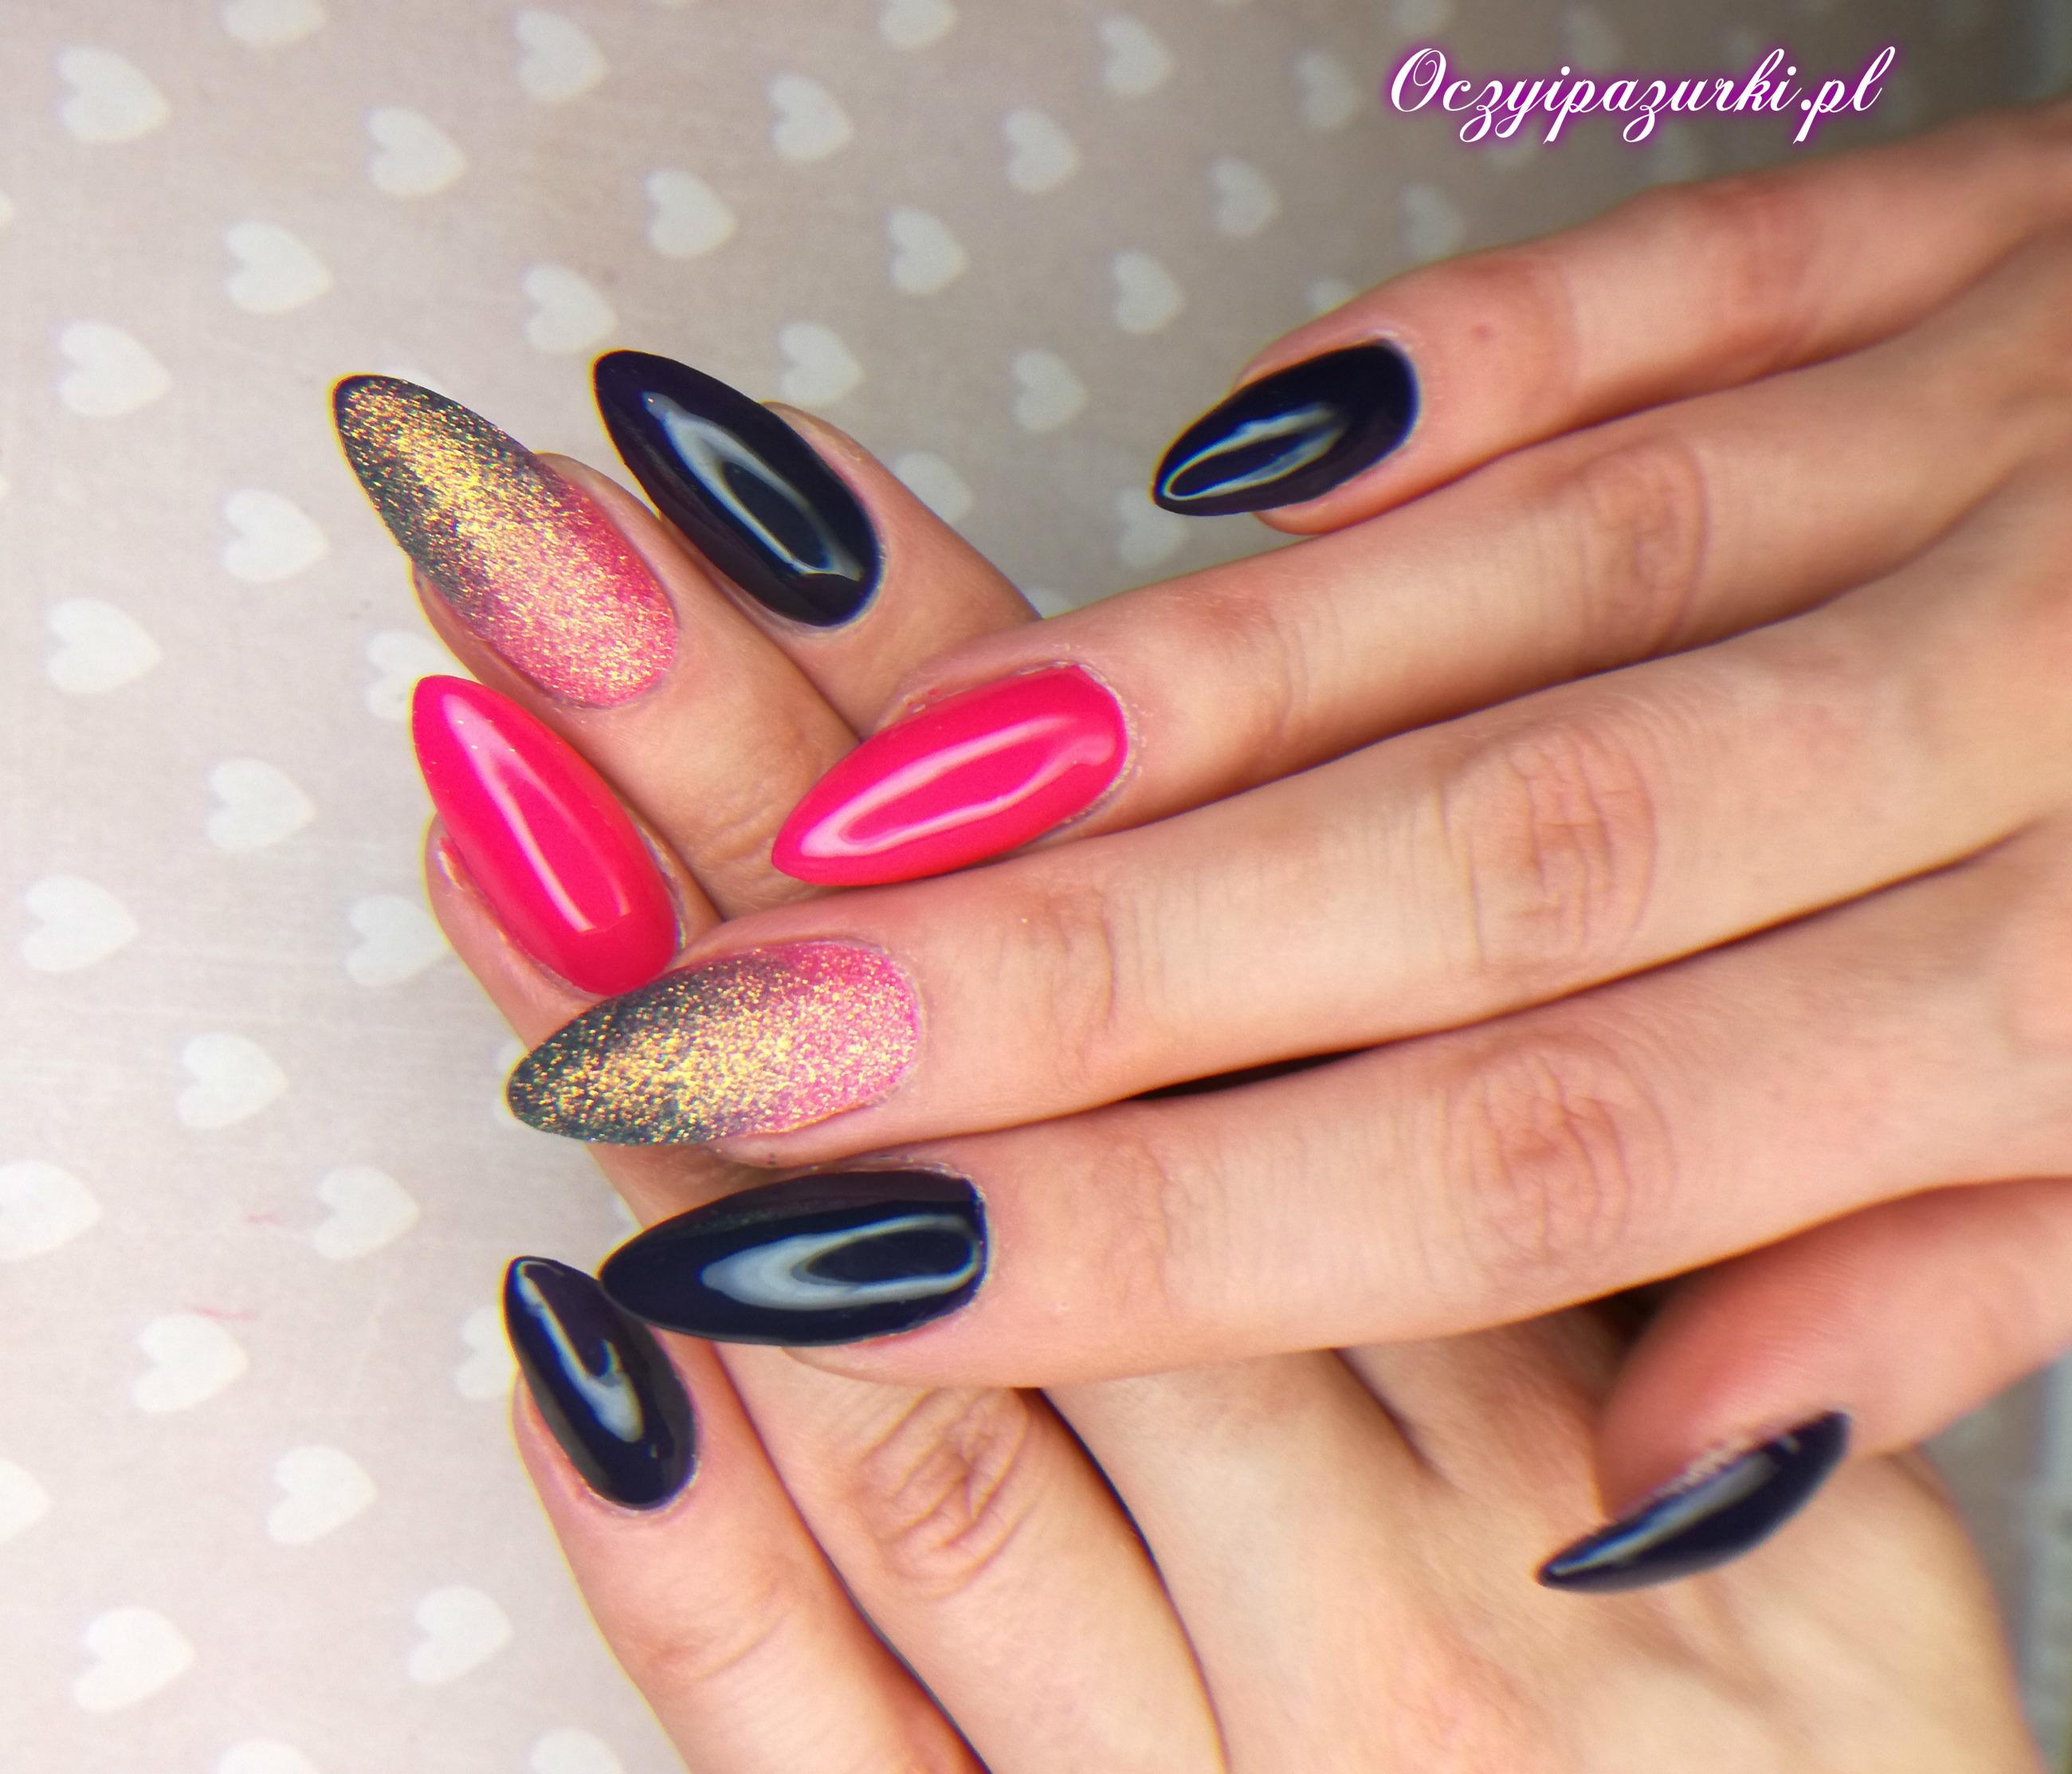 Inspiracje Manicure Na Sylwestra 2017 Wizazpl